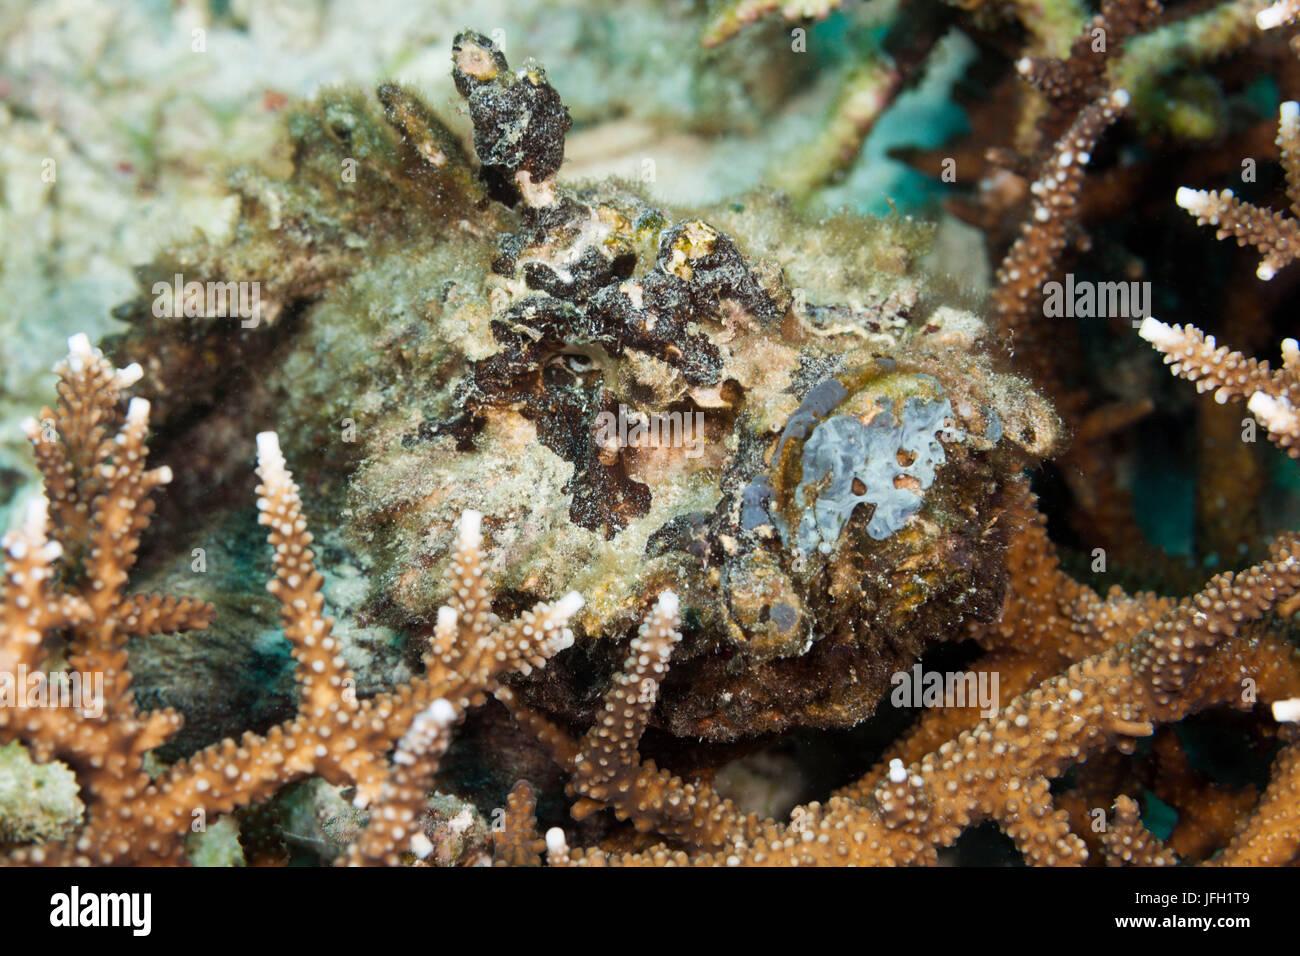 Real stone fish, Synanceia verrucosa, ambon, the Moluccas, Indonesia Stock Photo